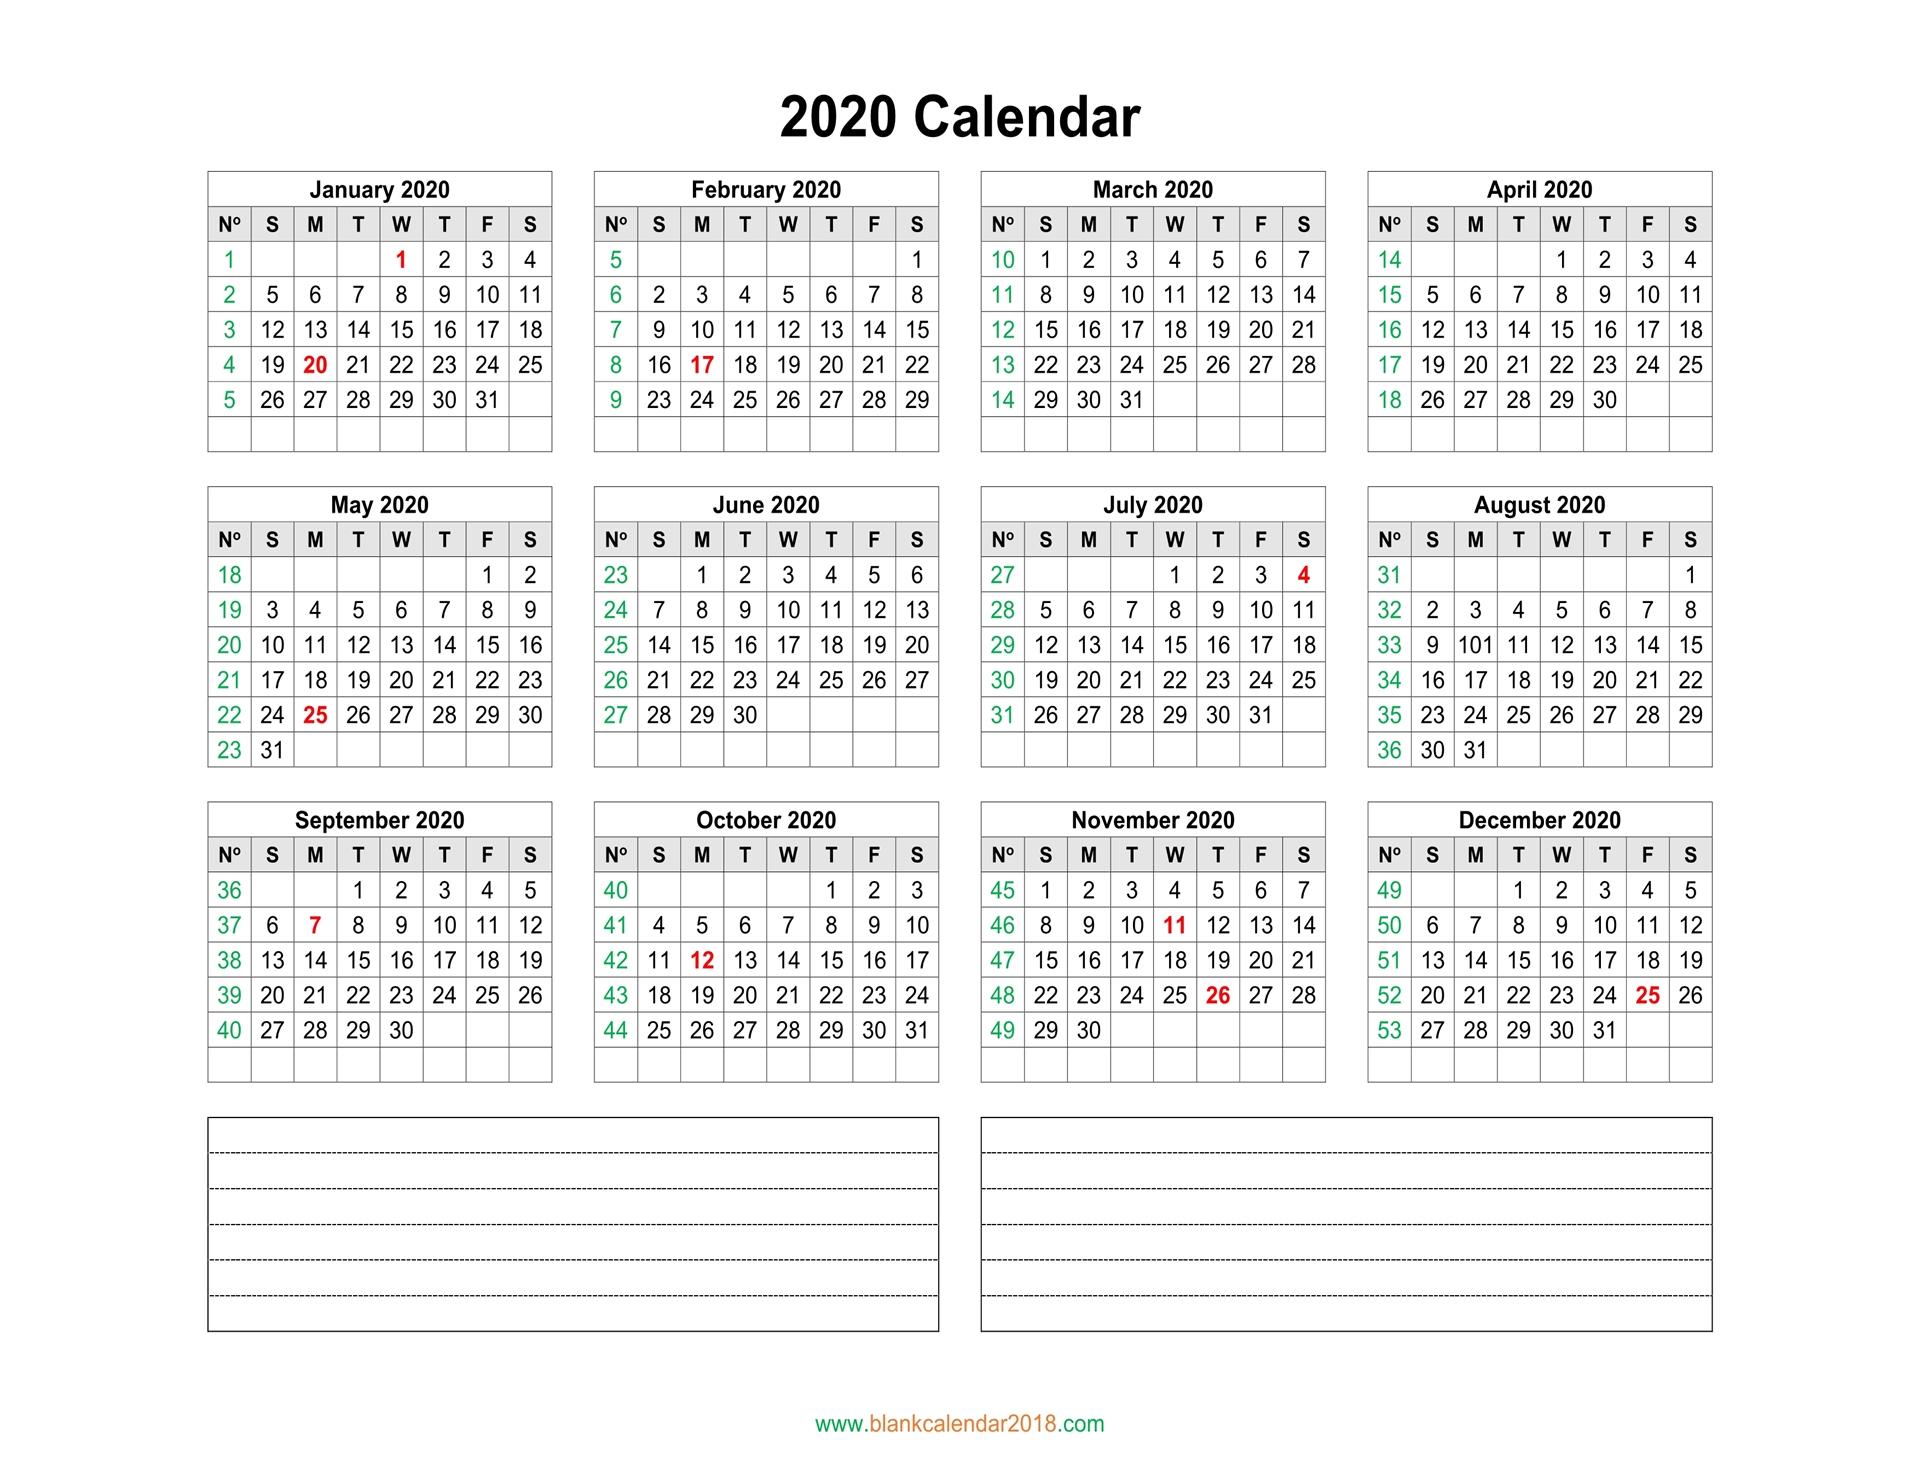 Blank Calendar 2020 inside 2020 Calendar By Month And Week Number Excel